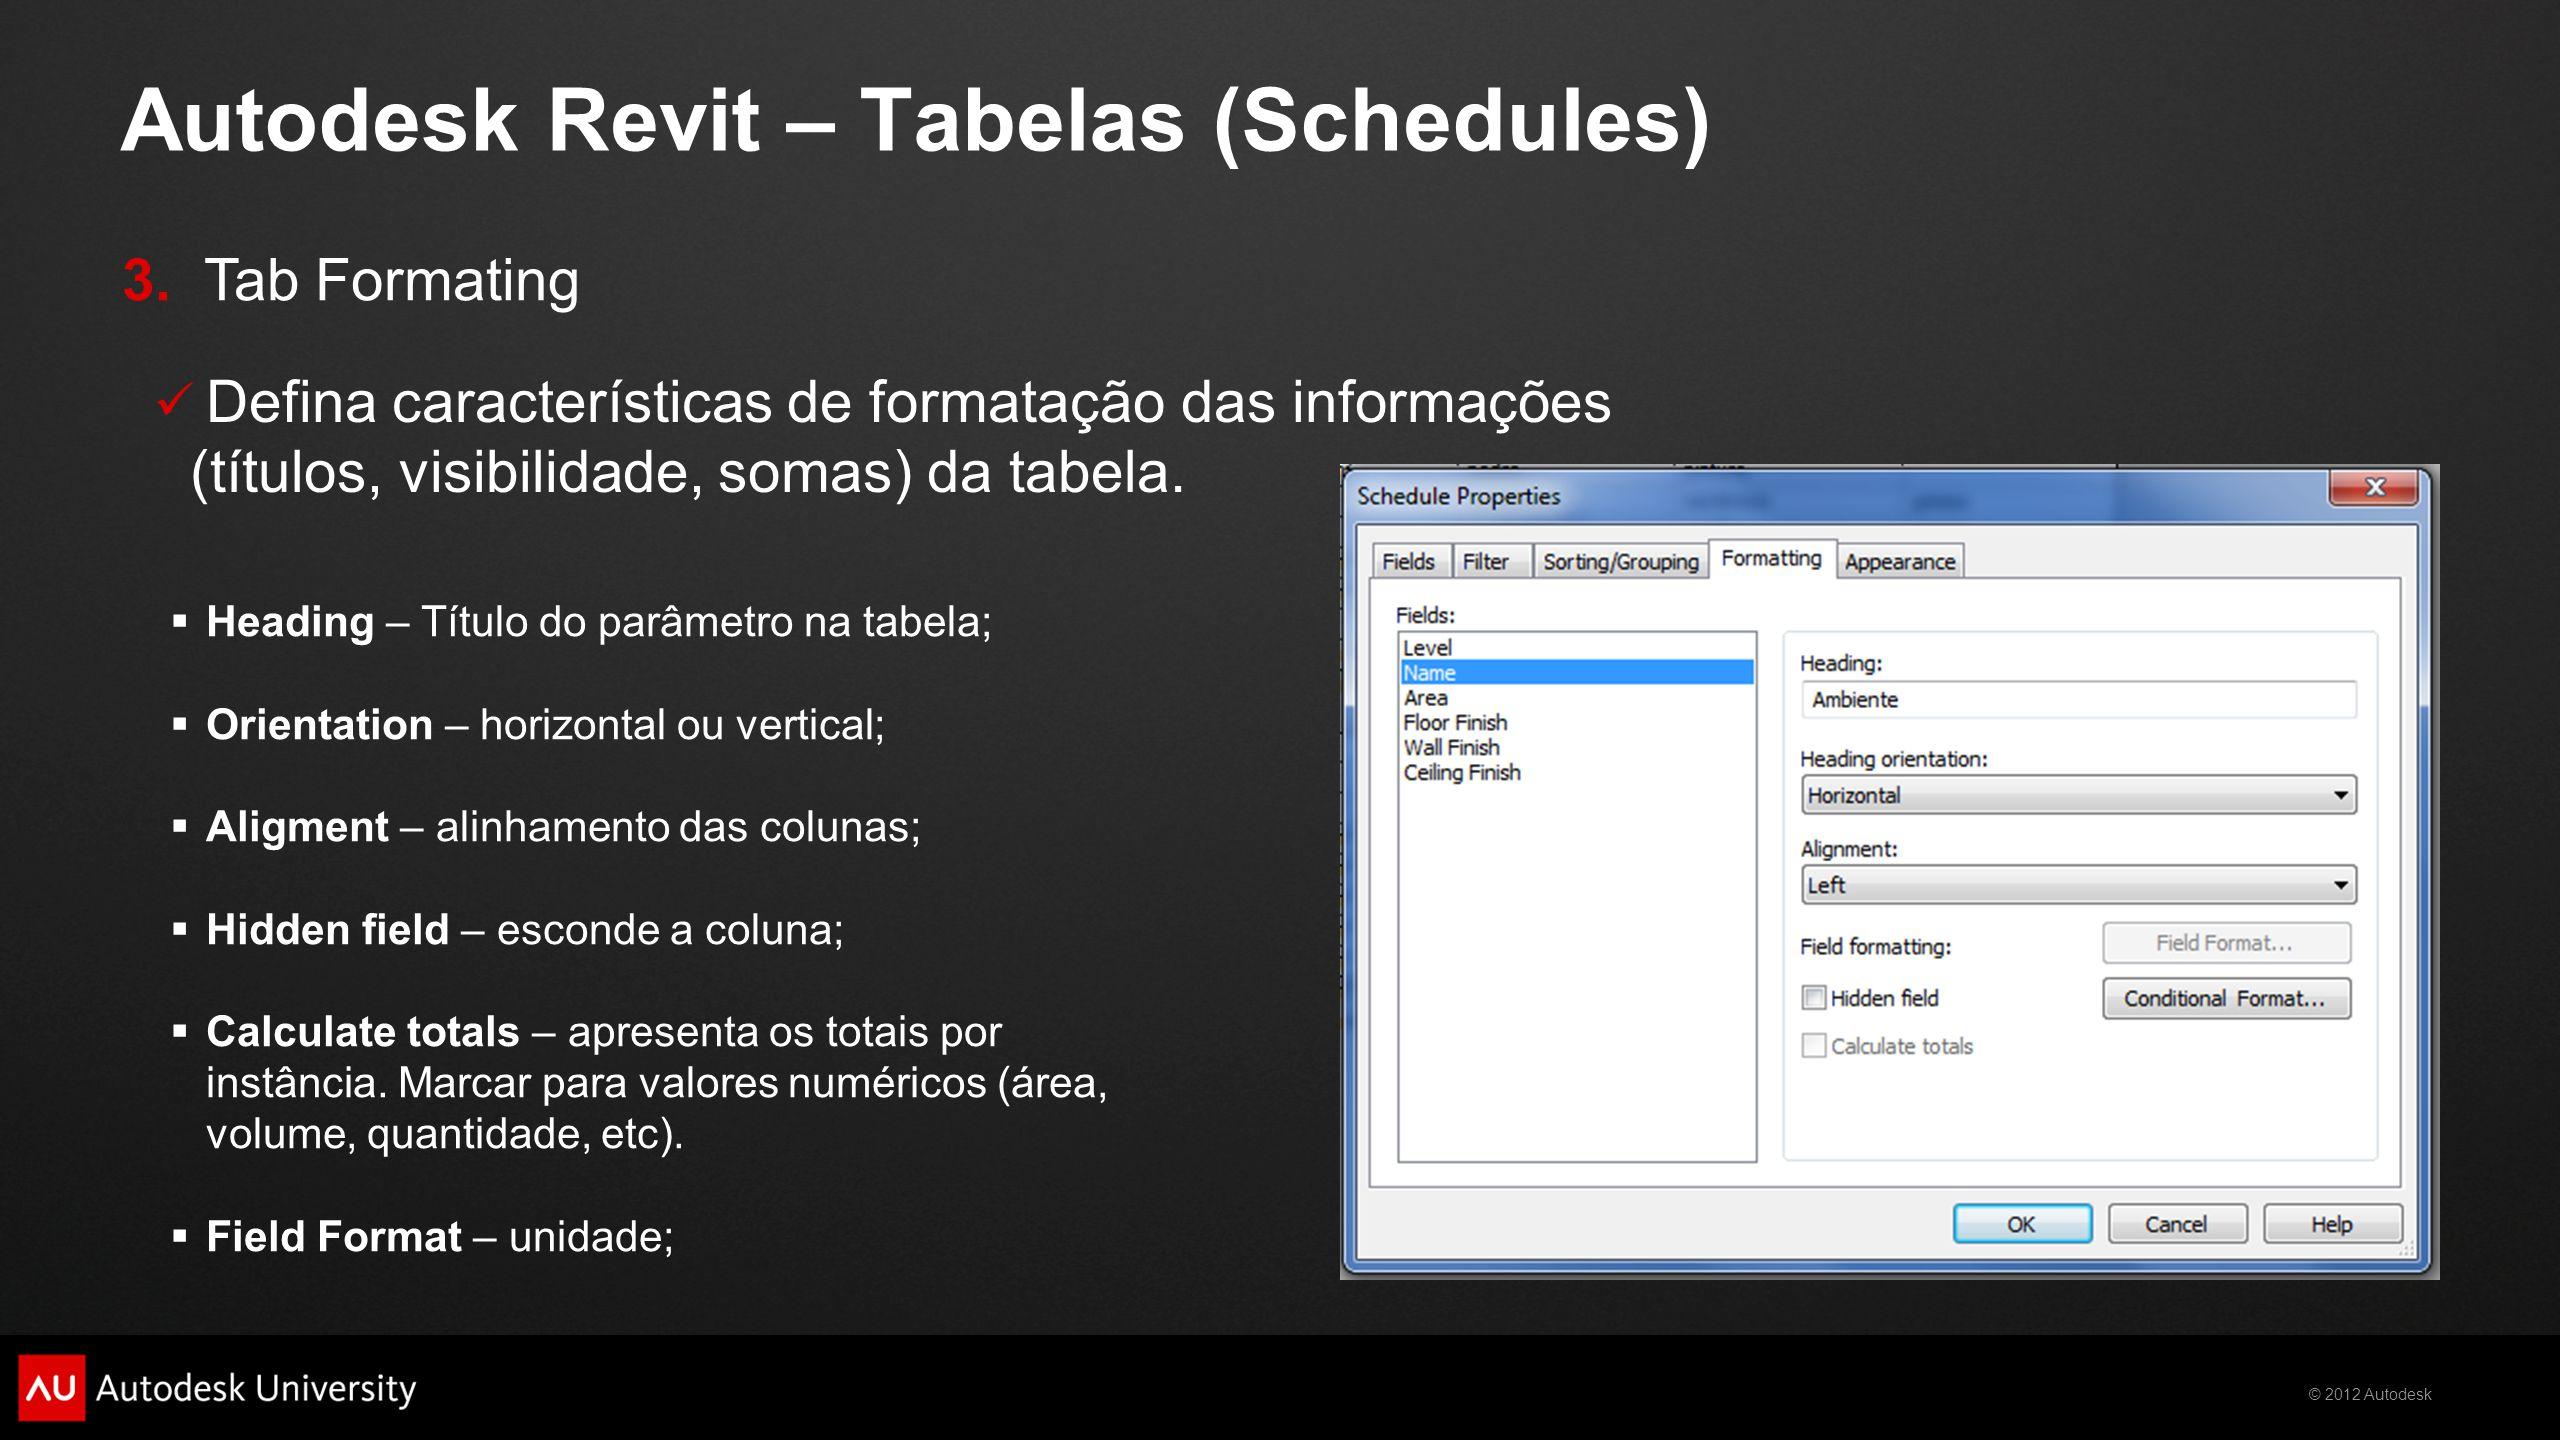 © 2012 Autodesk Autodesk Revit – Tabelas (Schedules)  Heading – Título do parâmetro na tabela;  Orientation – horizontal ou vertical;  Aligment – a